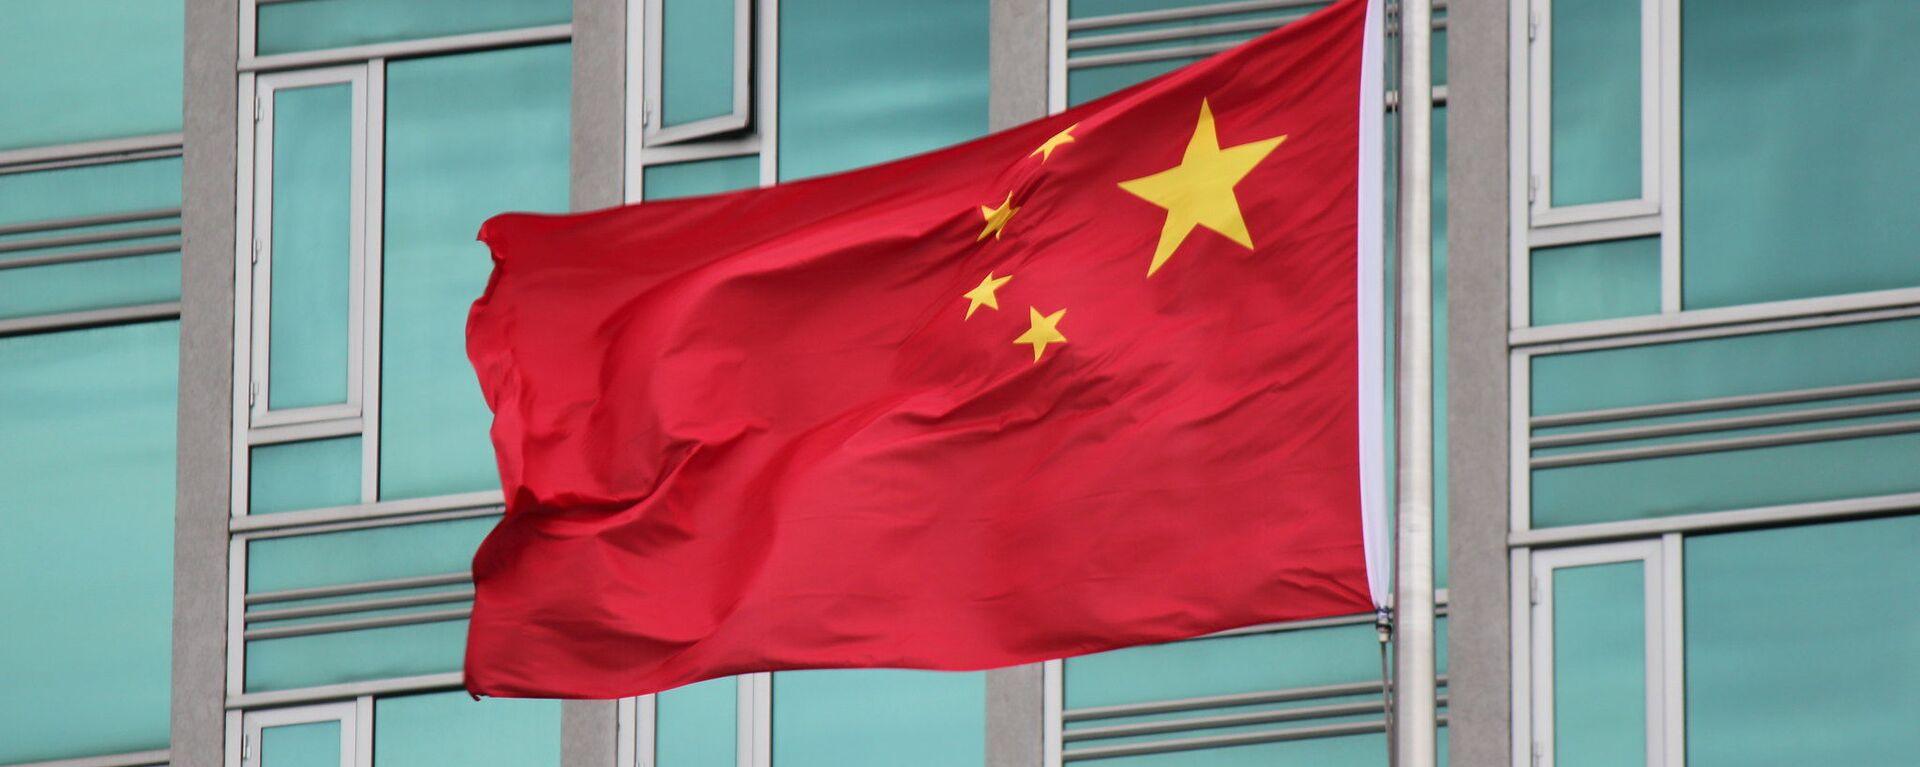 Chinese flag - Sputnik International, 1920, 16.09.2021